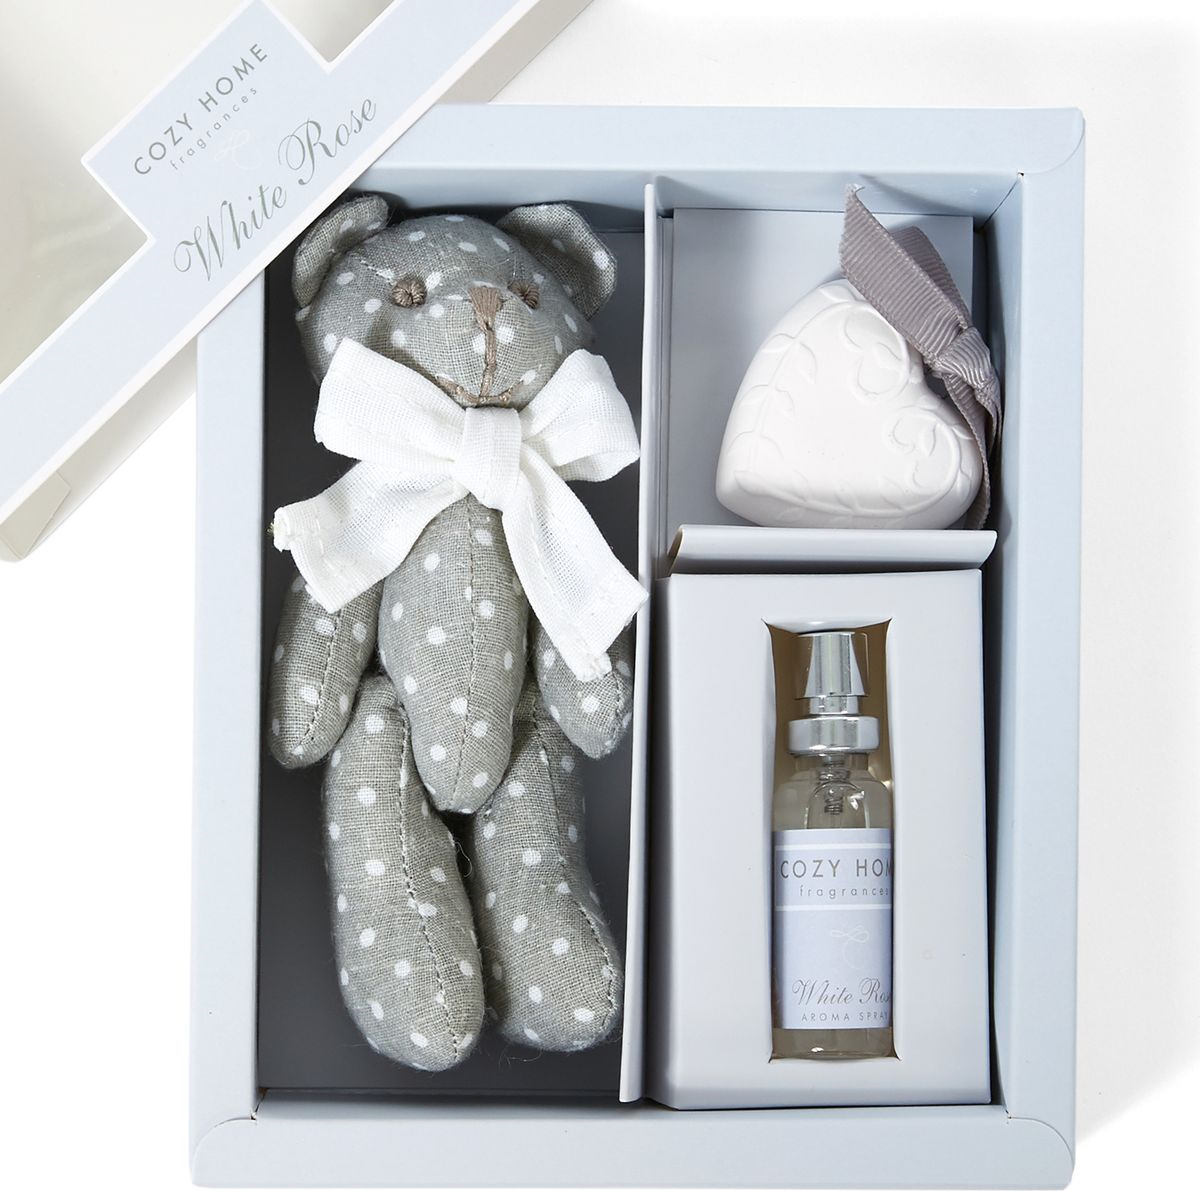 Ароматический набор Cozy Home White Rose Спрей, 10 мл + Сувенир + Фигурка, 504955 arteast 15694 фигурка гипсовая последний звонок